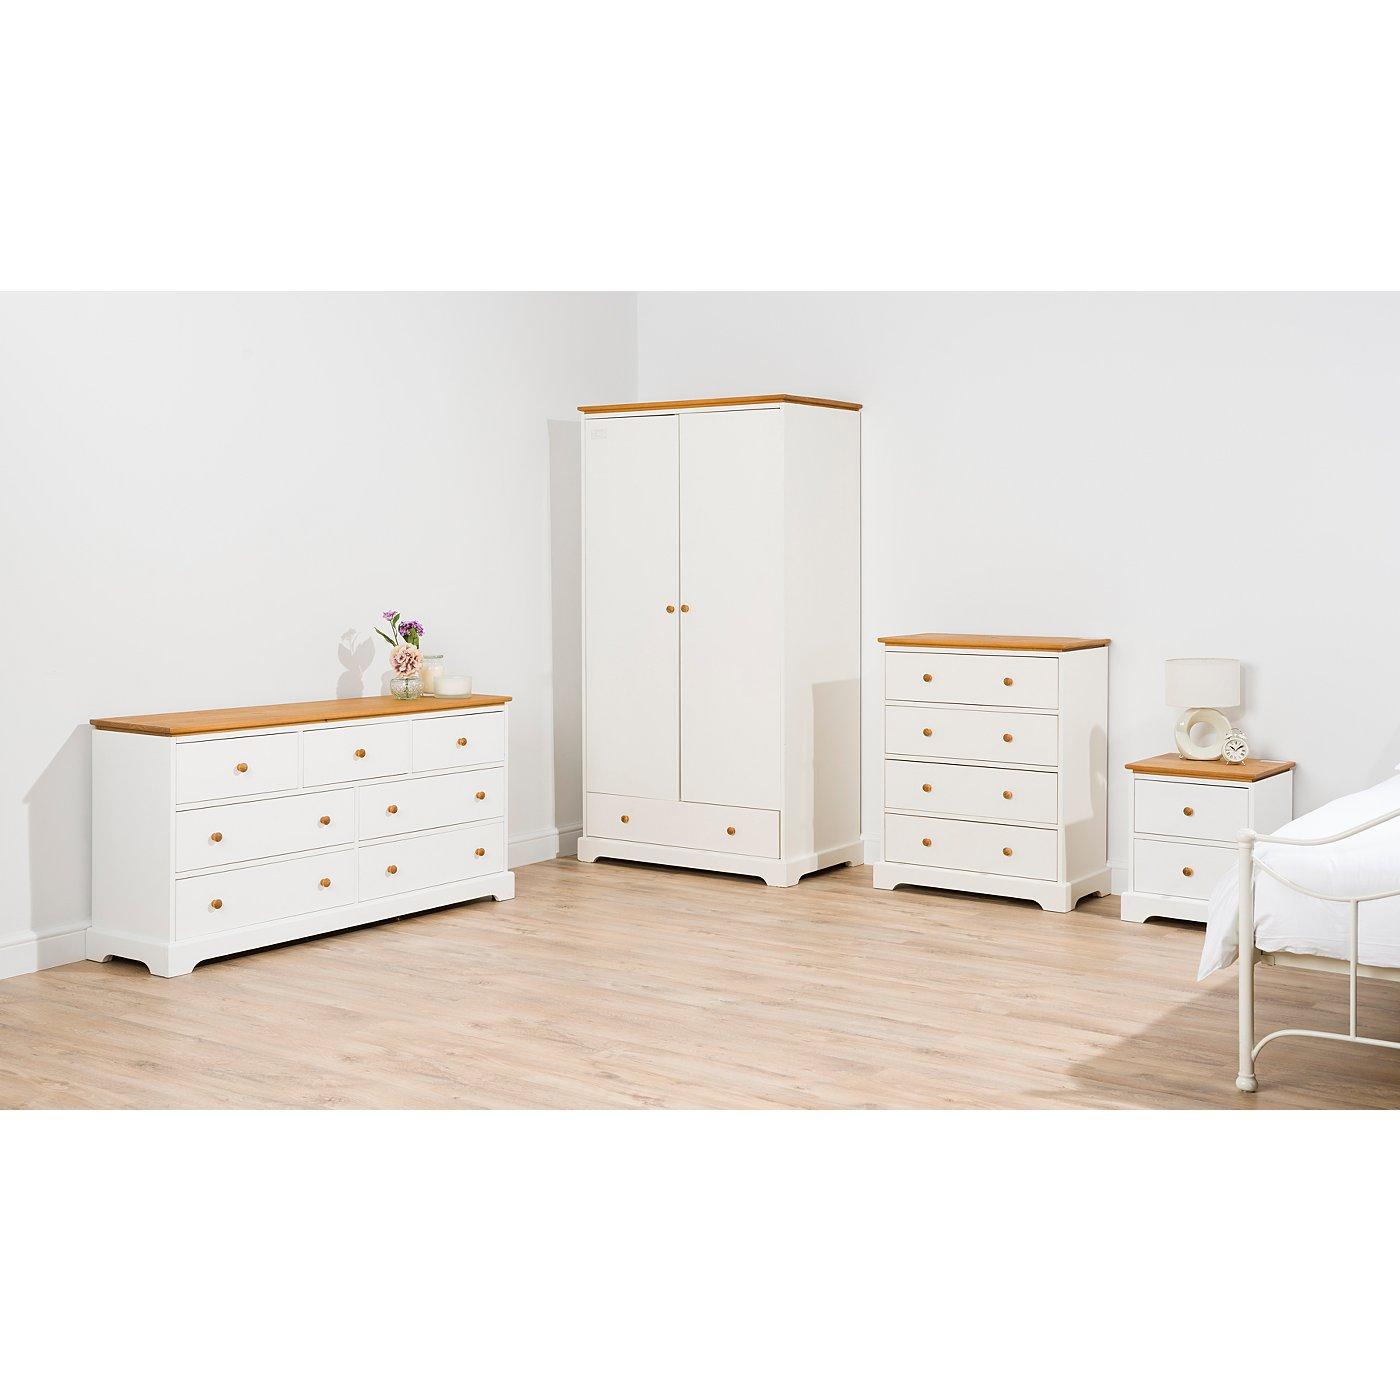 George Home Gilmore Bedroom Furniture Range   Two Tone  Loading zoom. George Home Gilmore Bedroom Furniture Range   Two Tone   Chest of